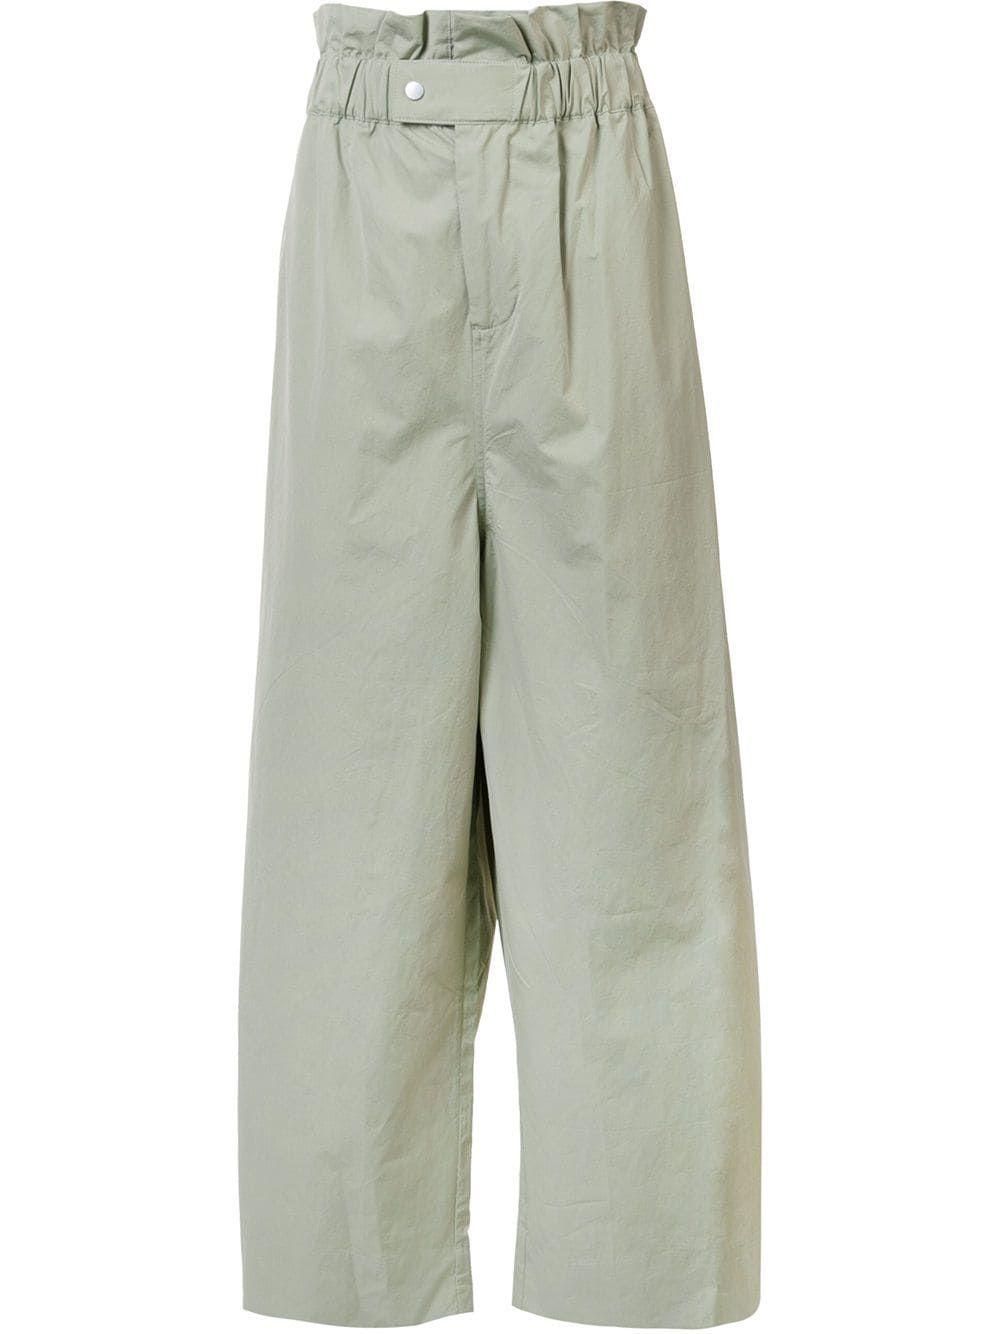 Draped Elastic Waistband Trousers Craig Green Trousers Women Wear